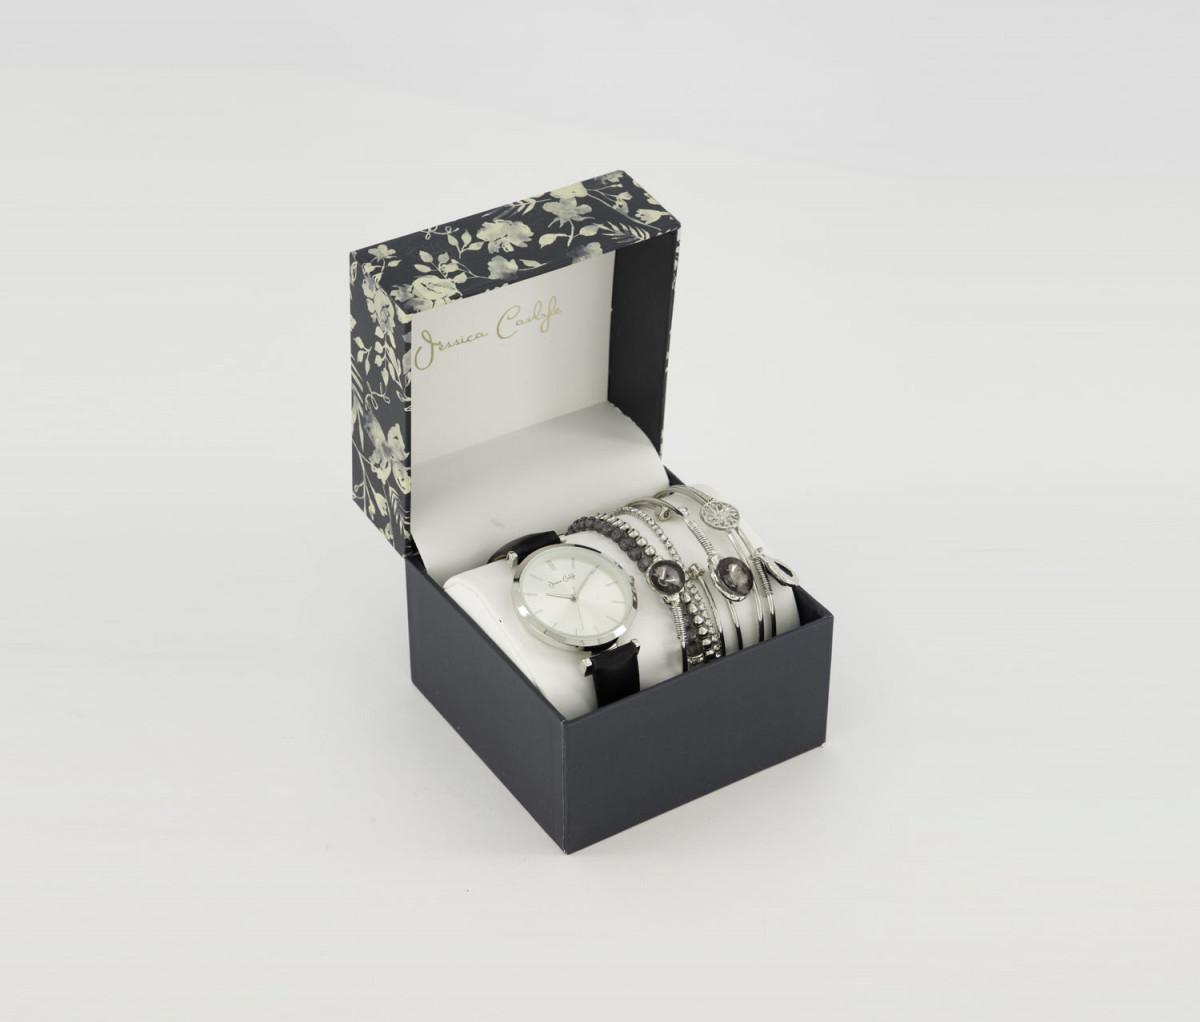 Jessica Carlyle Womens Analog Watch & Bracelet Set  Black/Silver